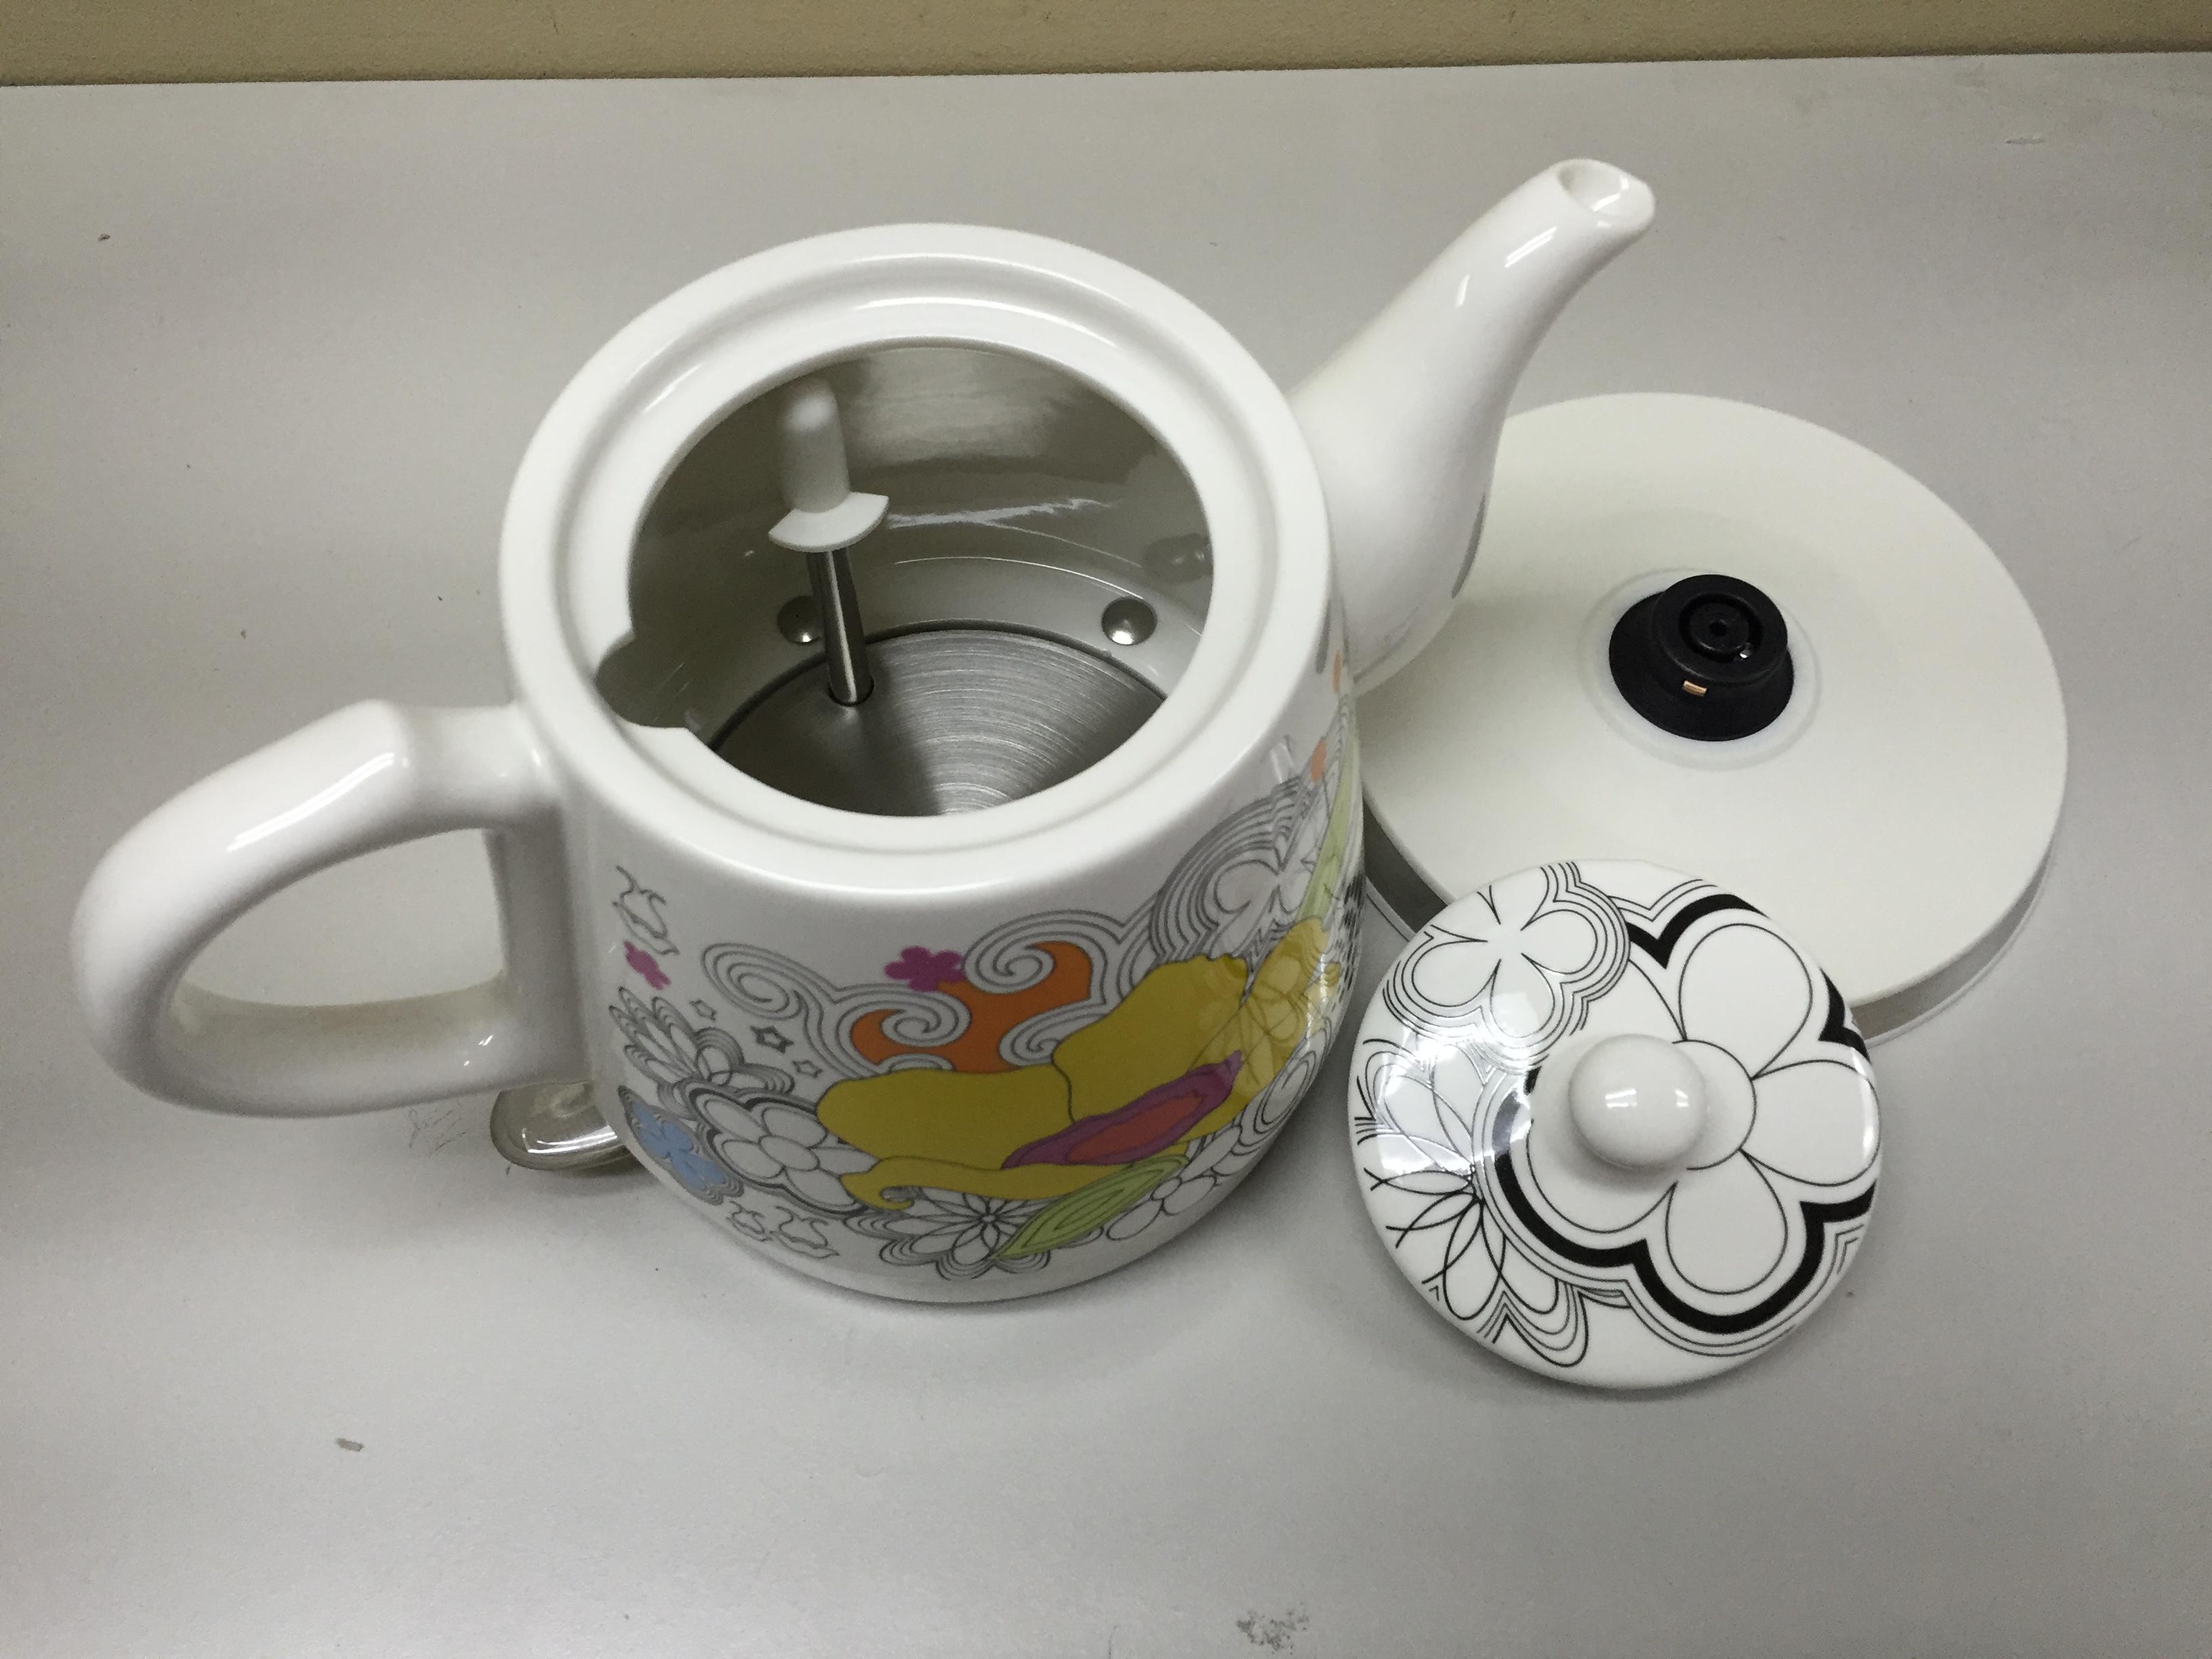 Porcelain Electric Kettle ~ Teapot ceramic electric kettle warm plate kitchen water